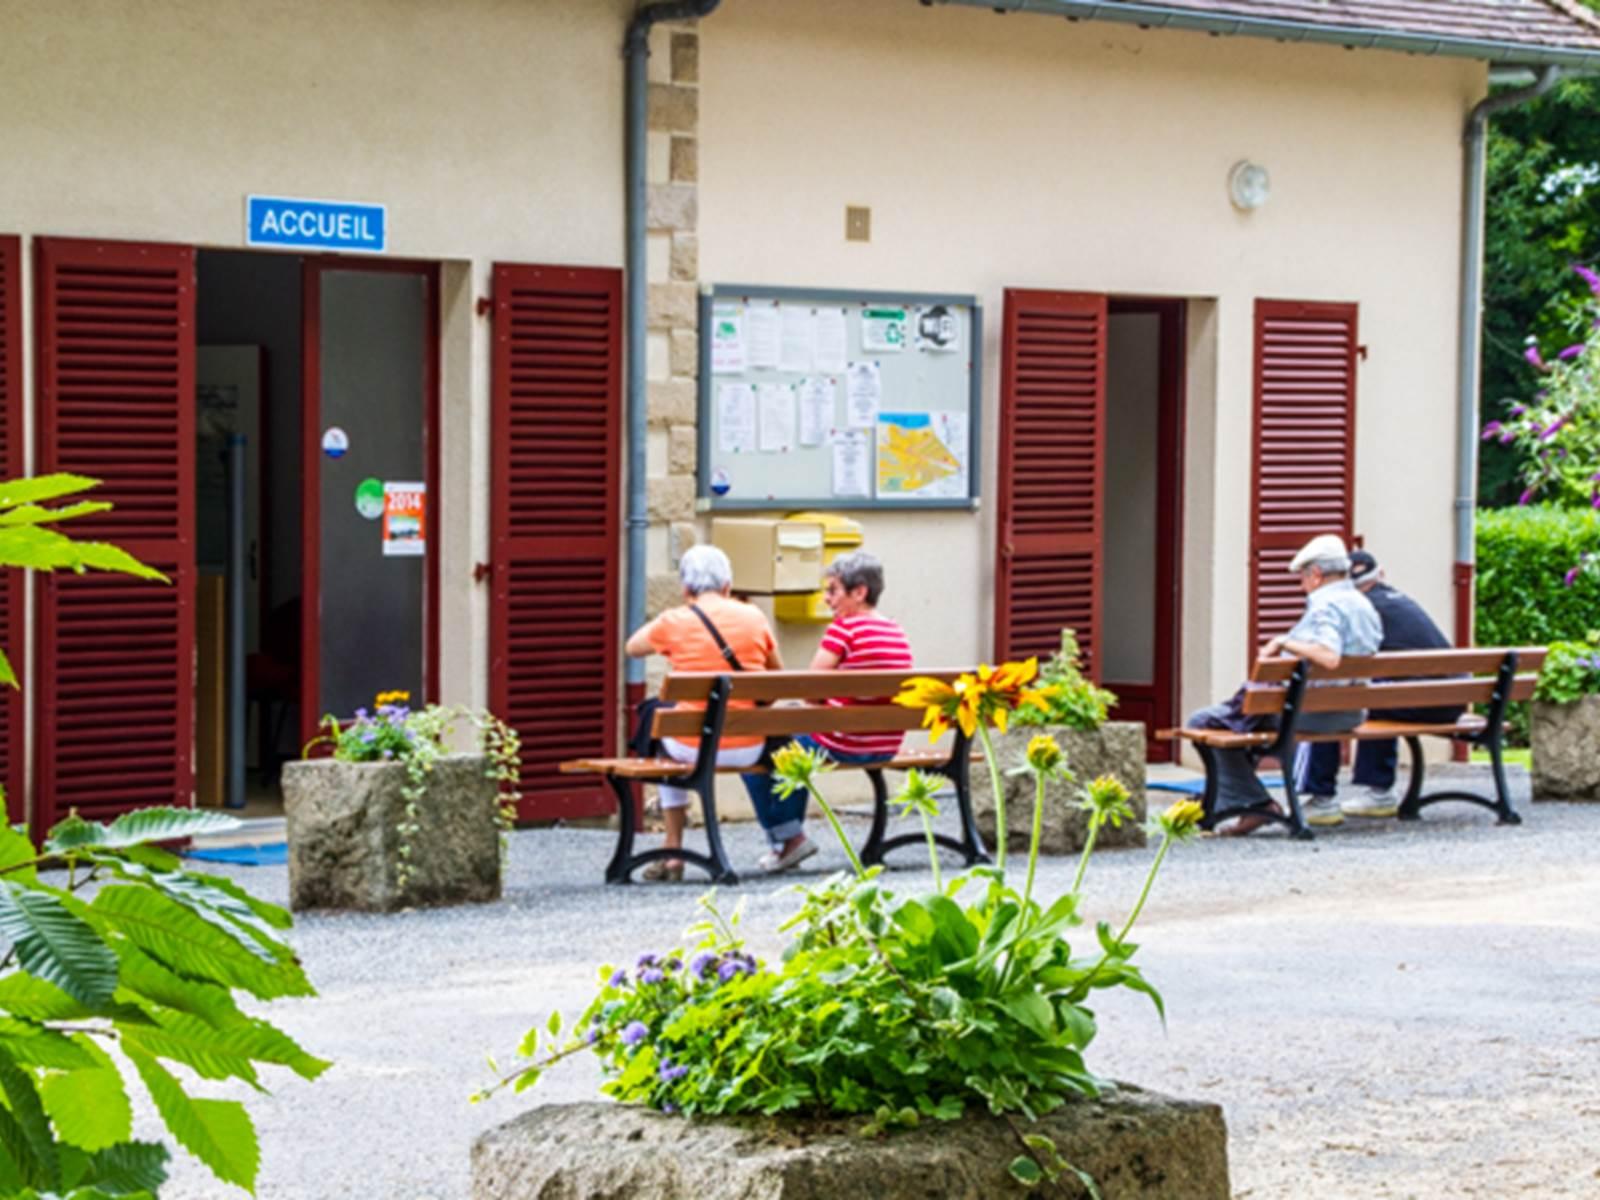 Camping de la lande Nexon en Limousin, l'accueil.